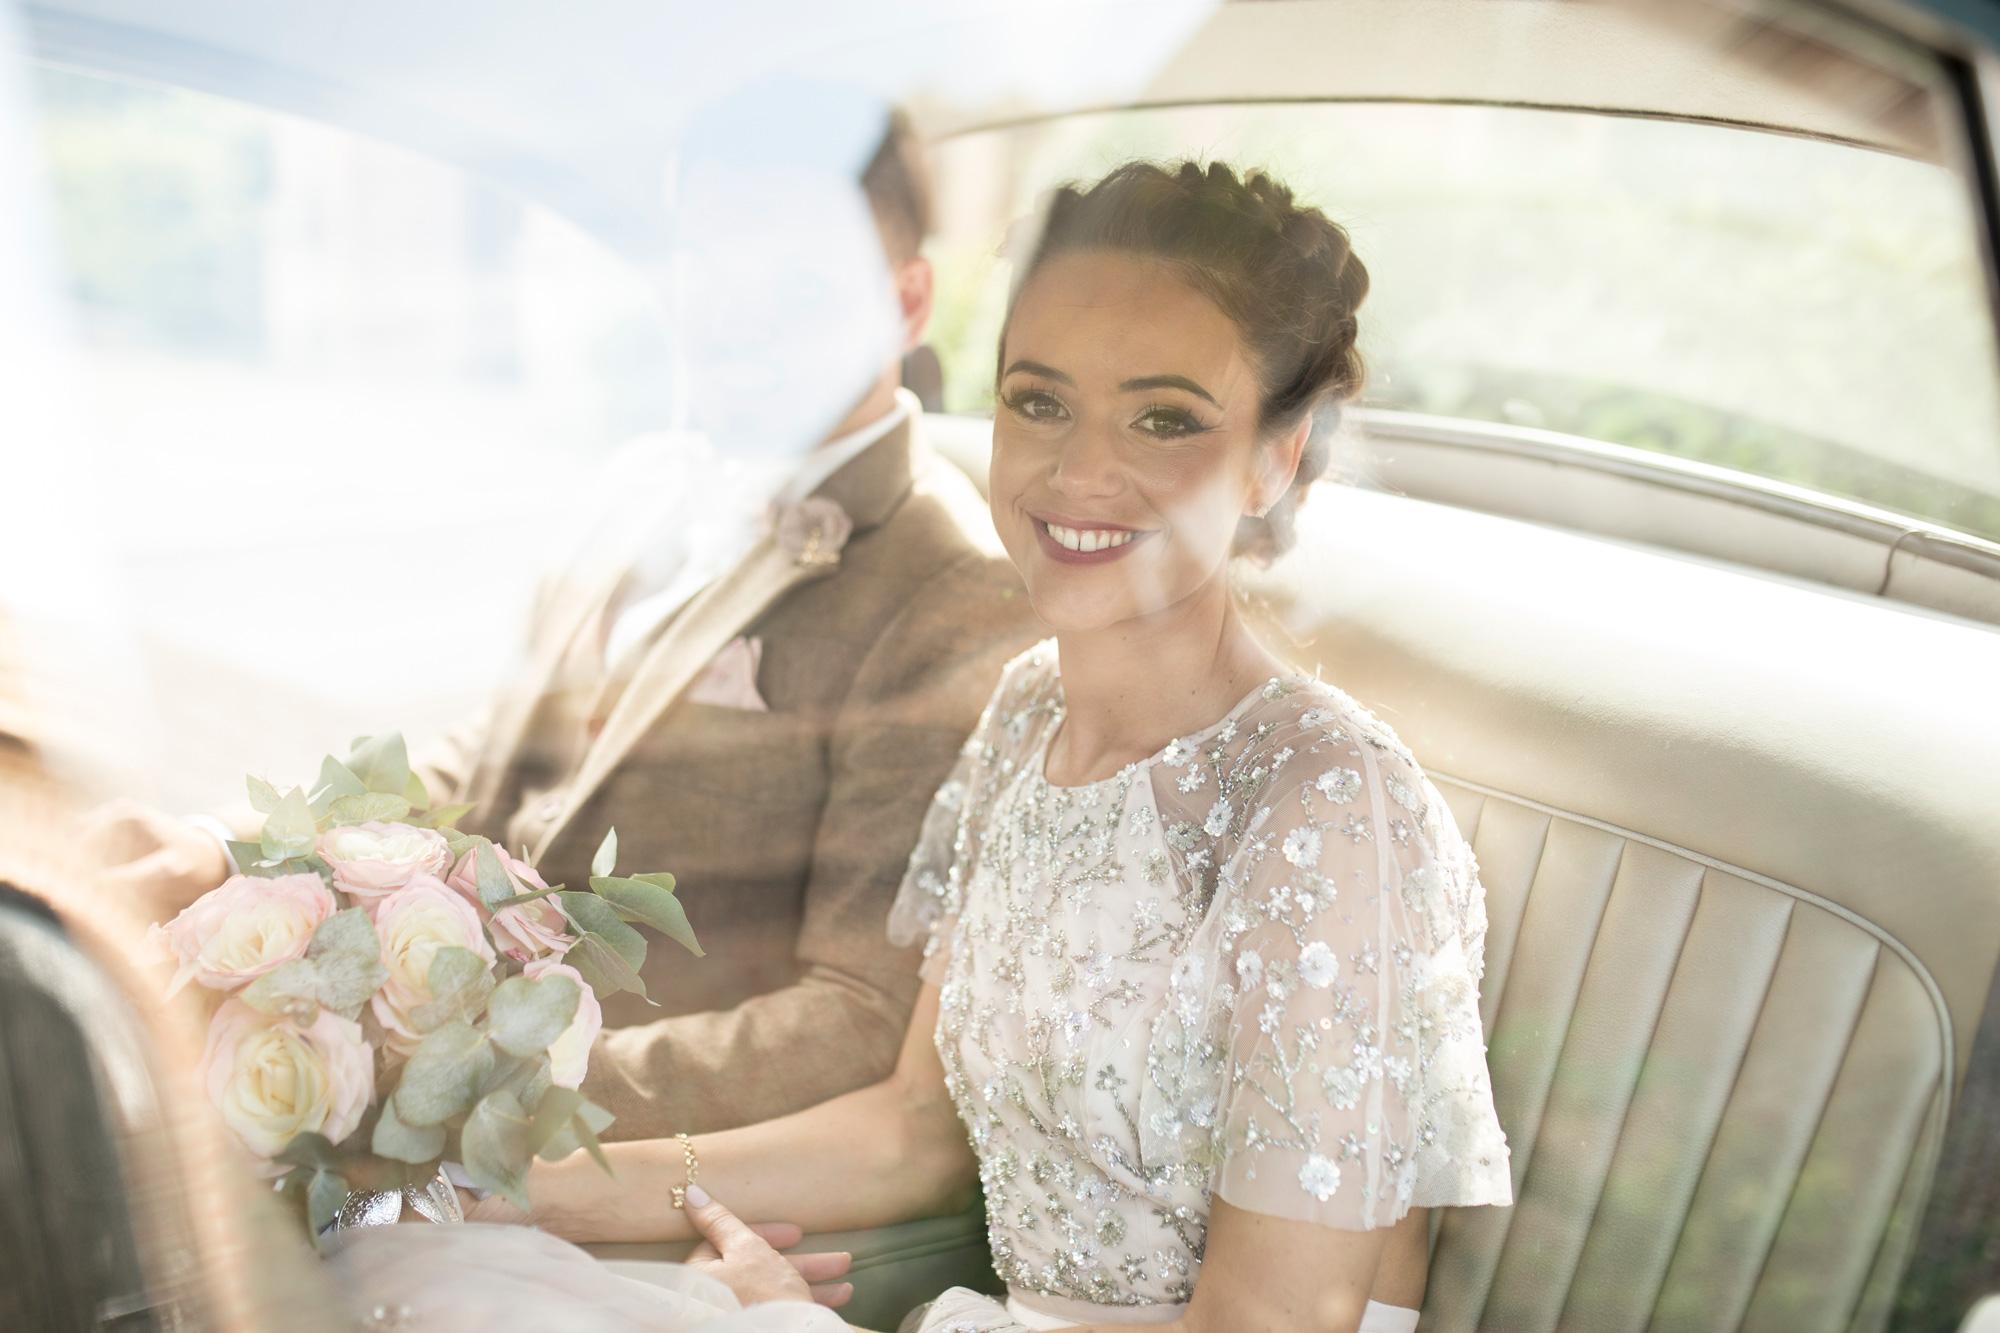 Car, Bride, Wedding Day, Buckinghamshire Wedding, Needle and Thread.